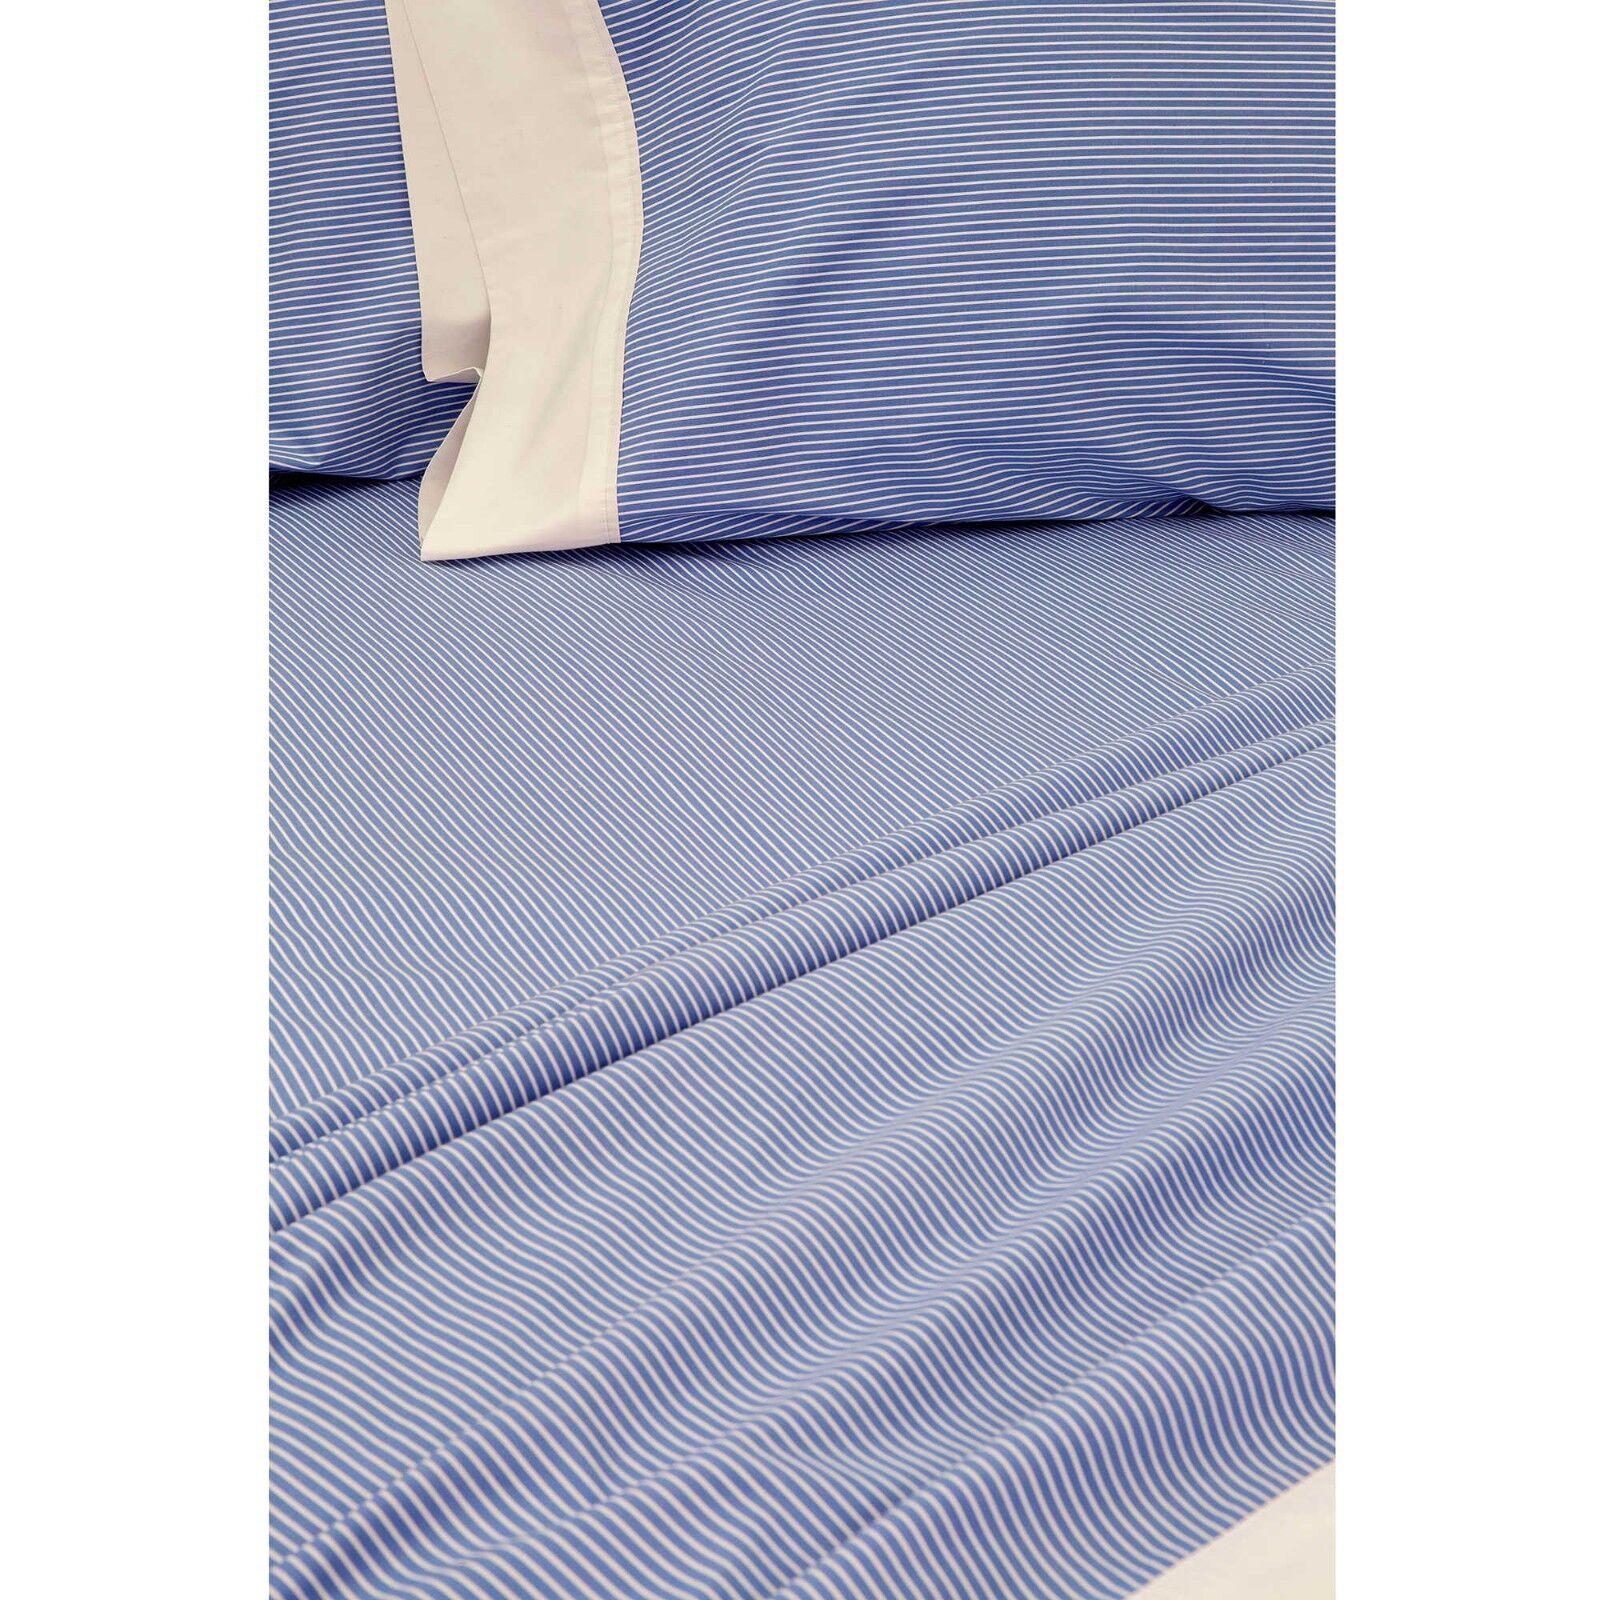 Bespoke Bengal Stripe Queen Sheet Set in blueeeee White With White Cuff